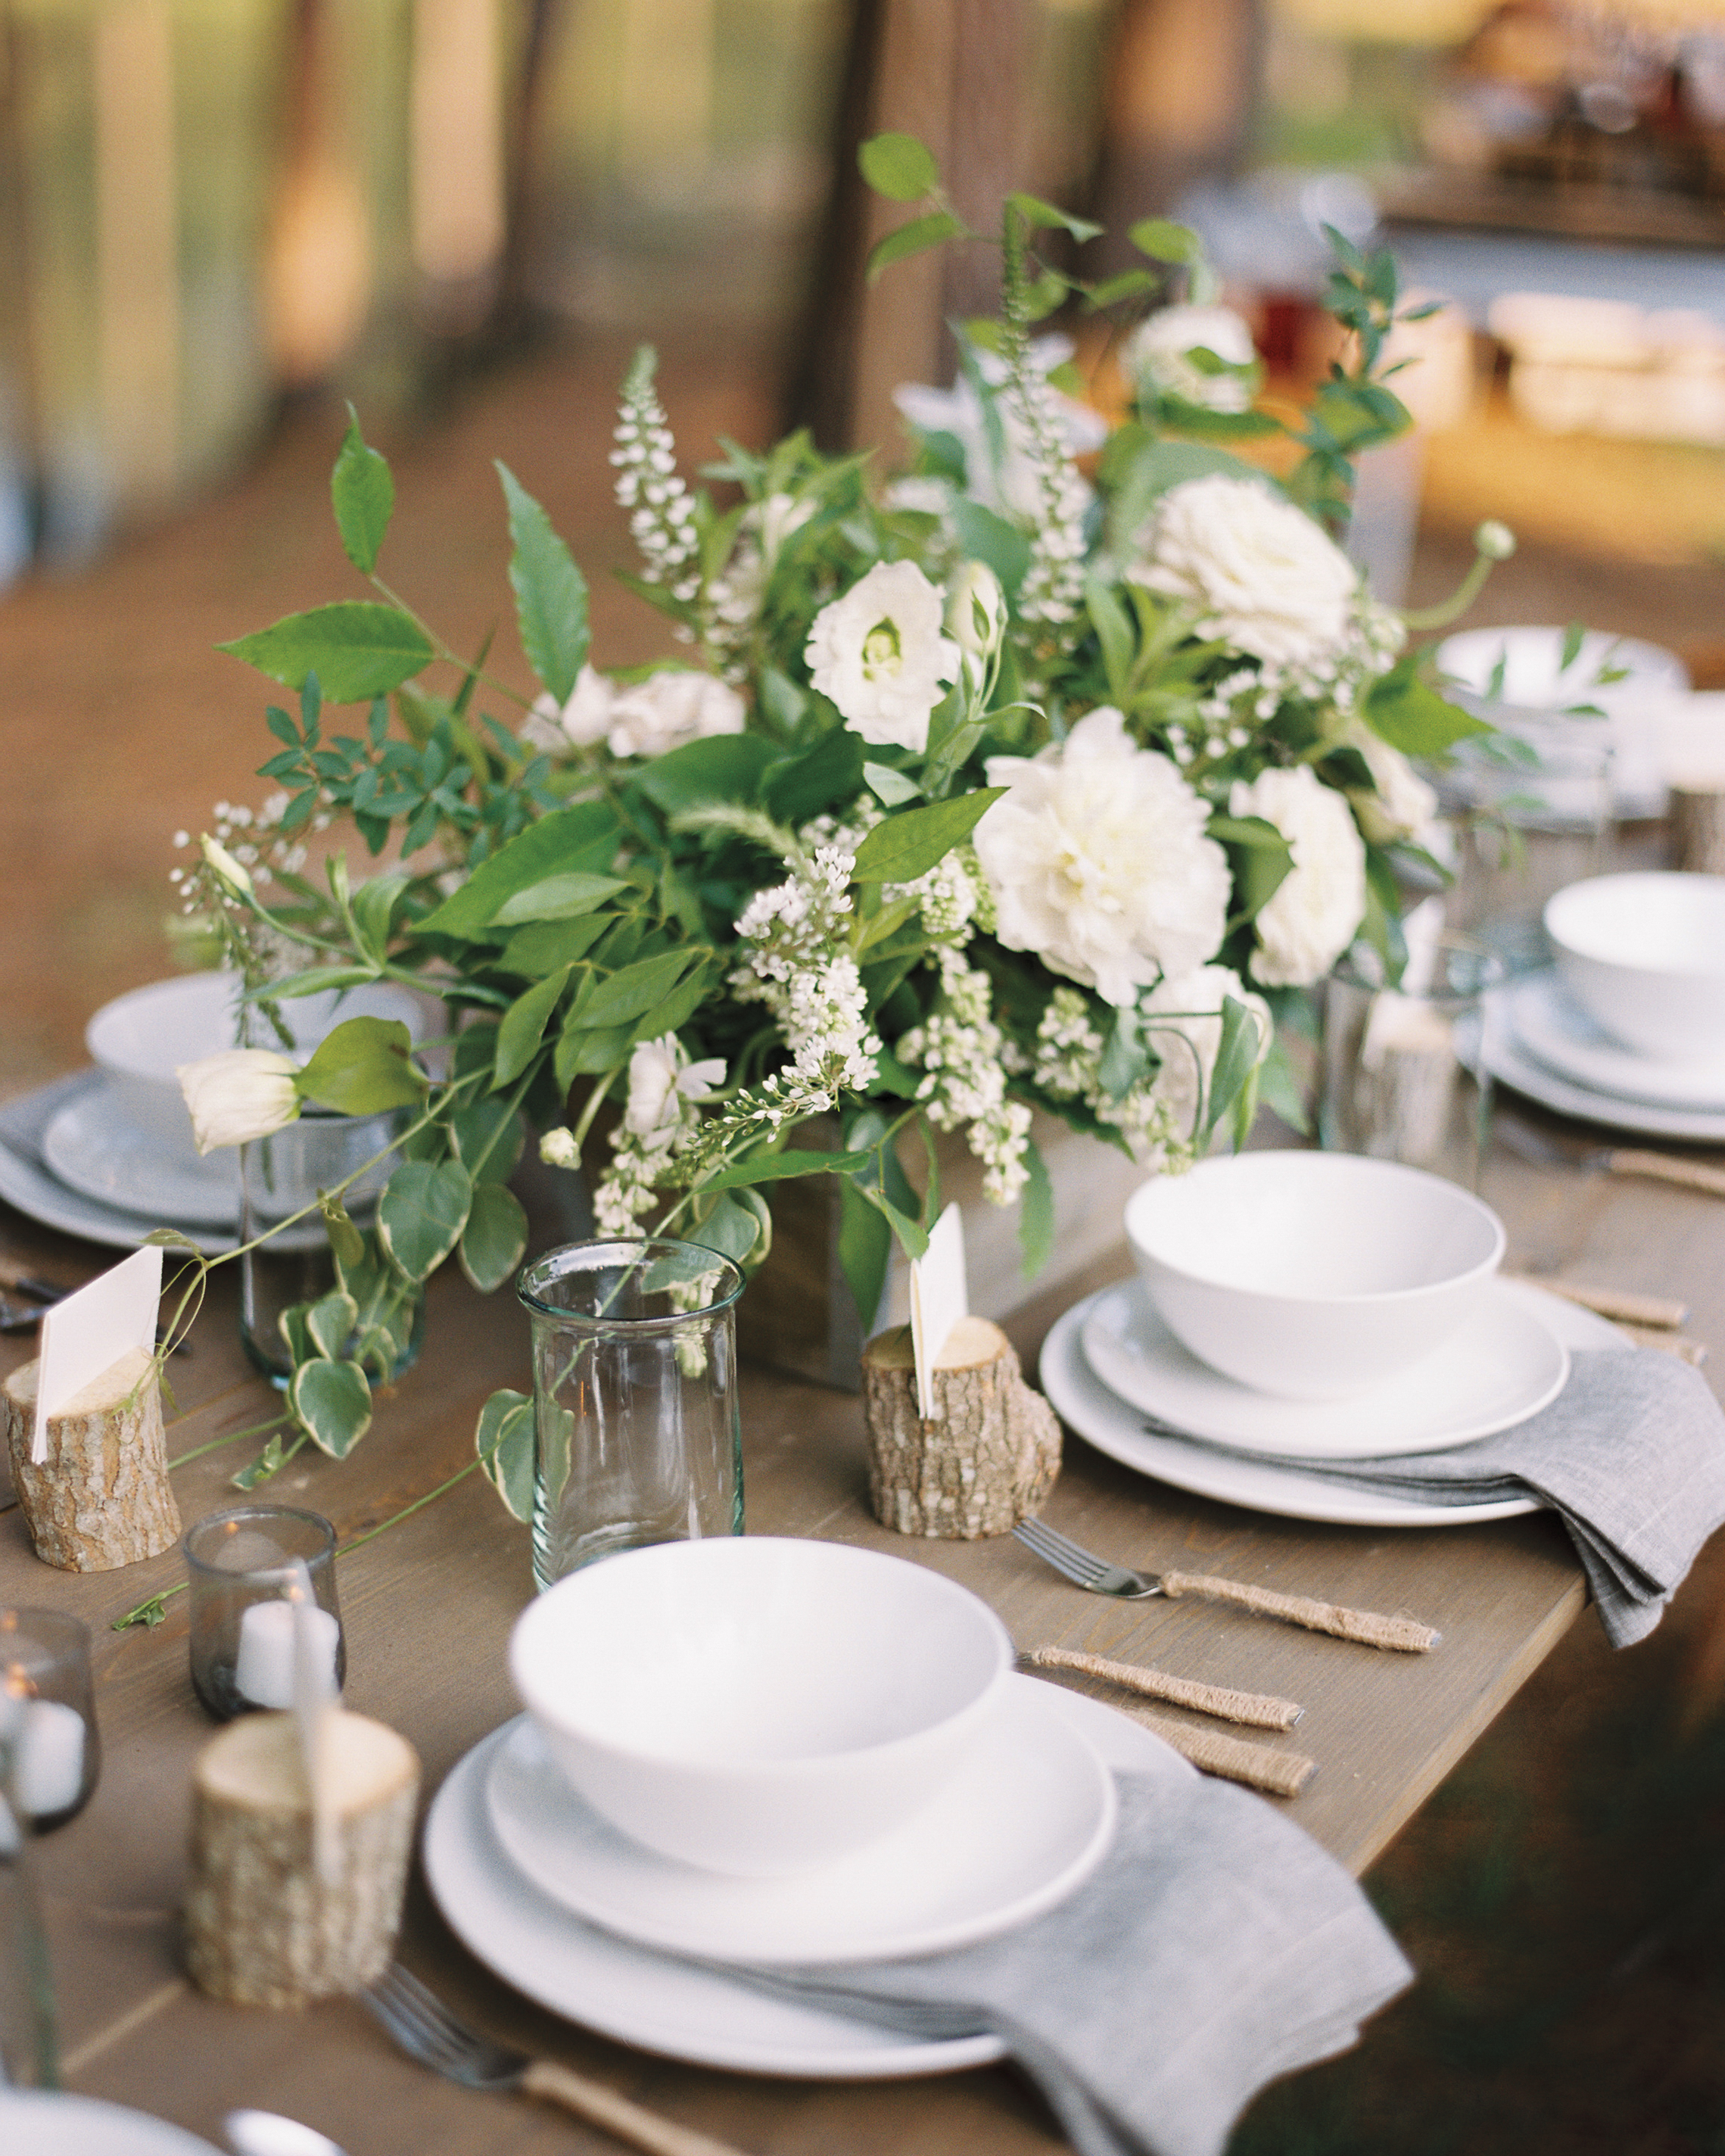 saron-neal-wedding-mississippi-00311-s111701.jpg